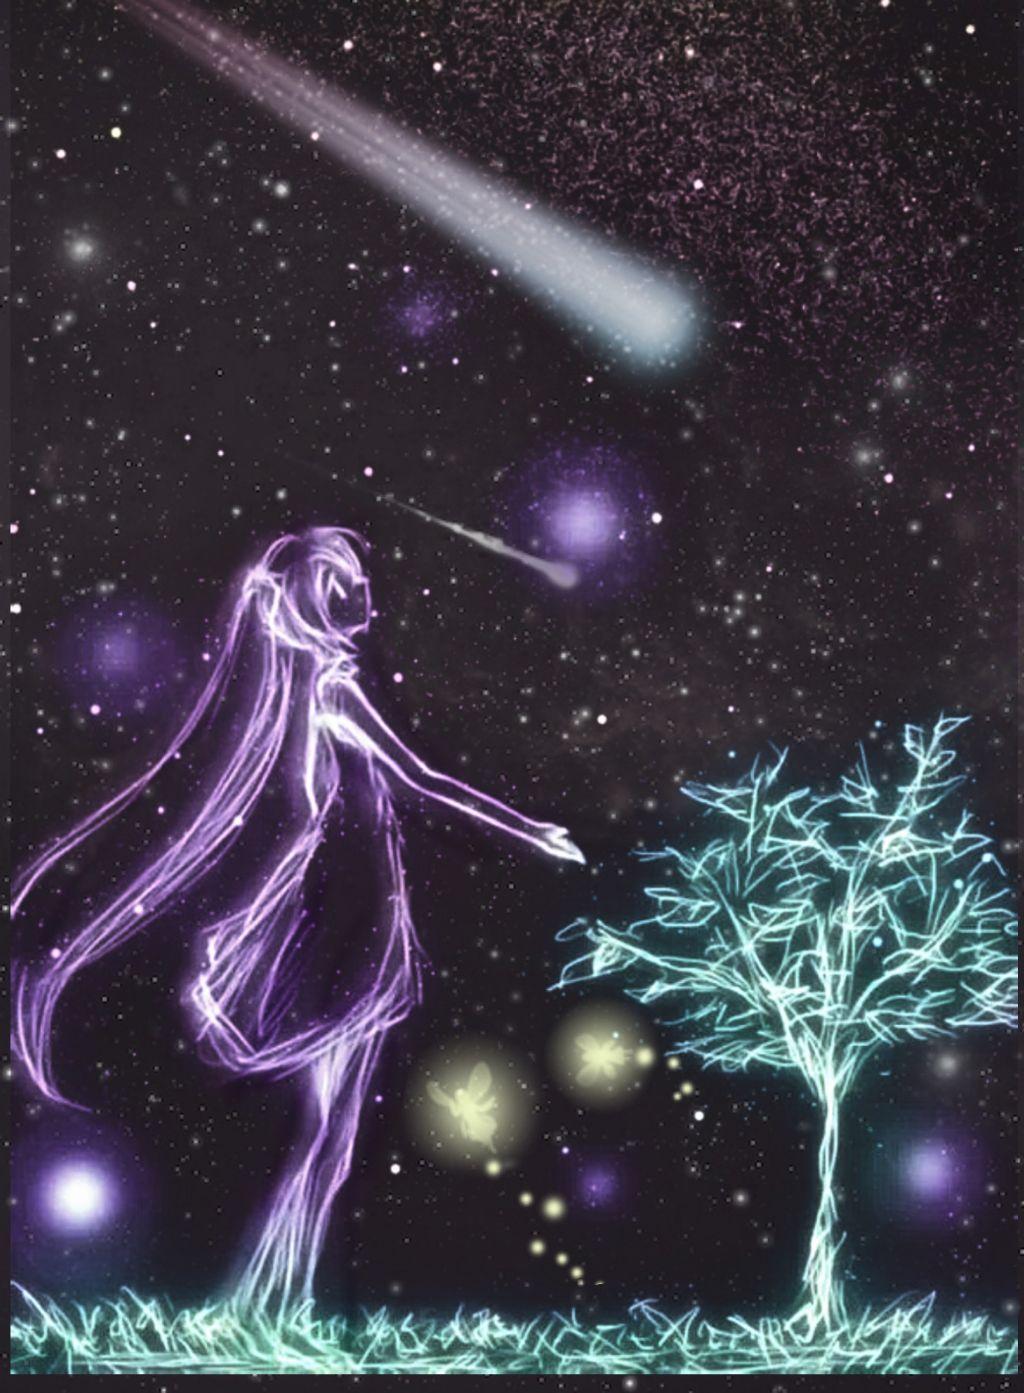 #freetoedit #girl #shootingstar #wishonastar #neon #lighteffects #nighttime #colorful #artistic #layersonlayers #stickerart #myedit #madewithpicsart